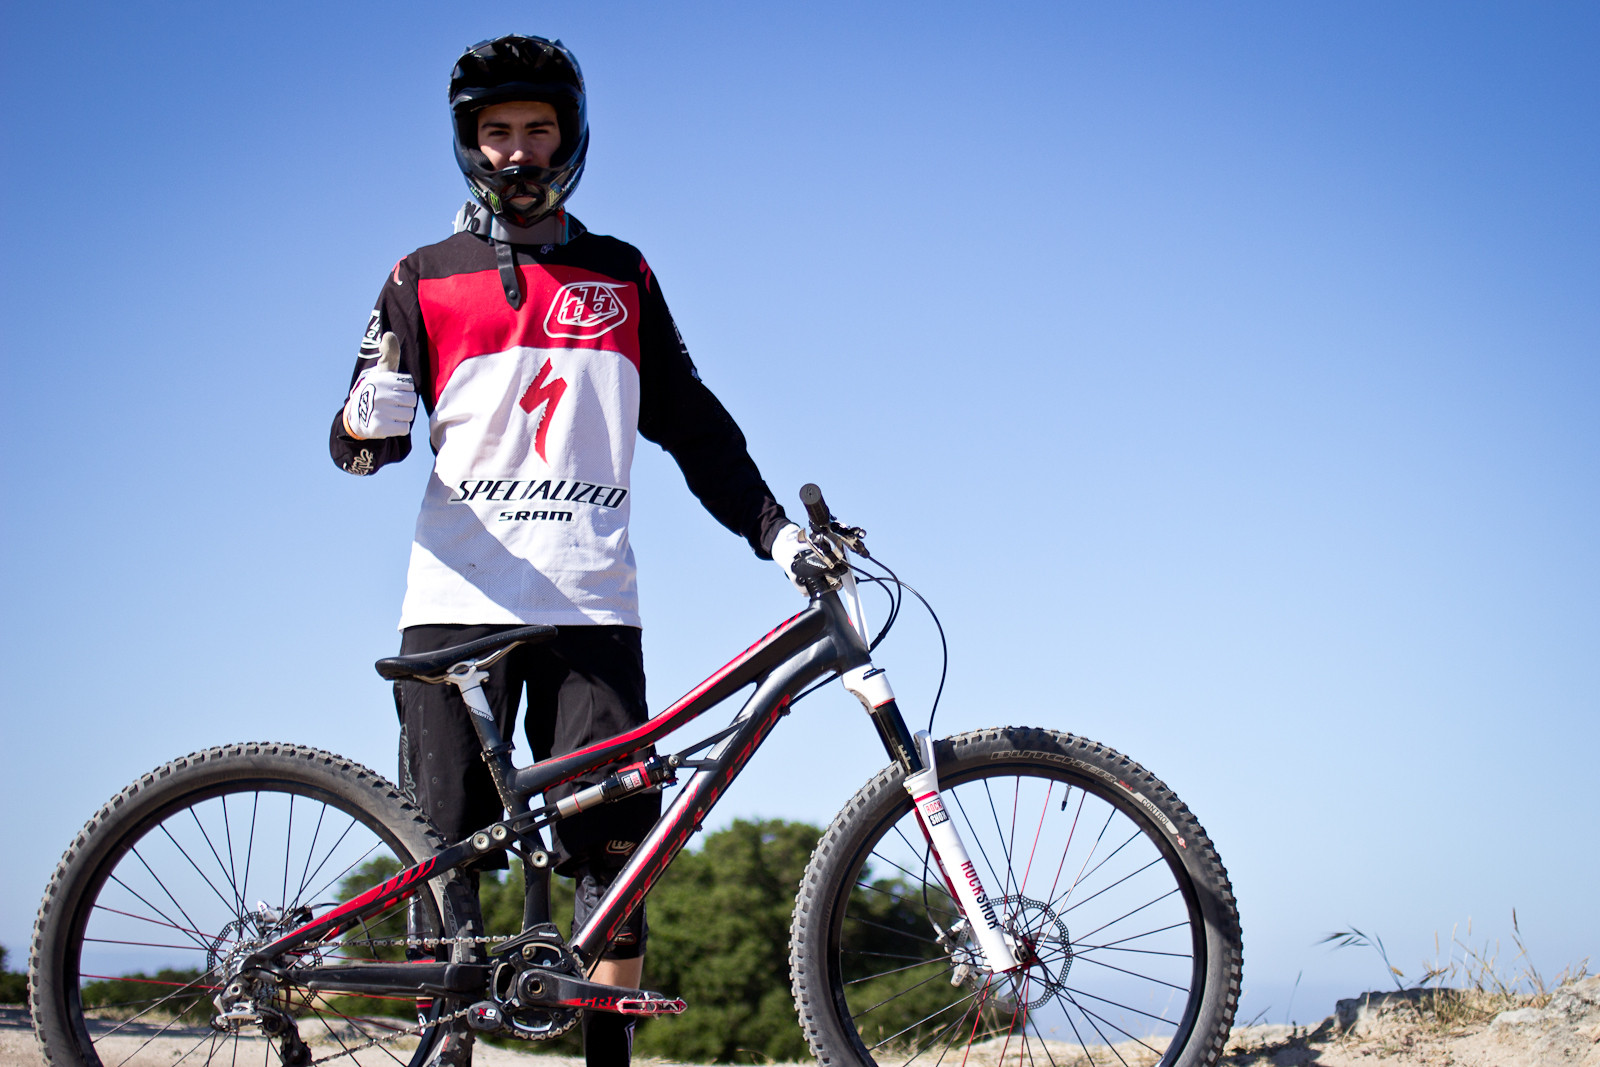 Walker Shaw's 2014 Specialized Enduro SX Slalom Bike - 2013 Sea Otter Pro Slalom Bikes - Mountain Biking Pictures - Vital MTB